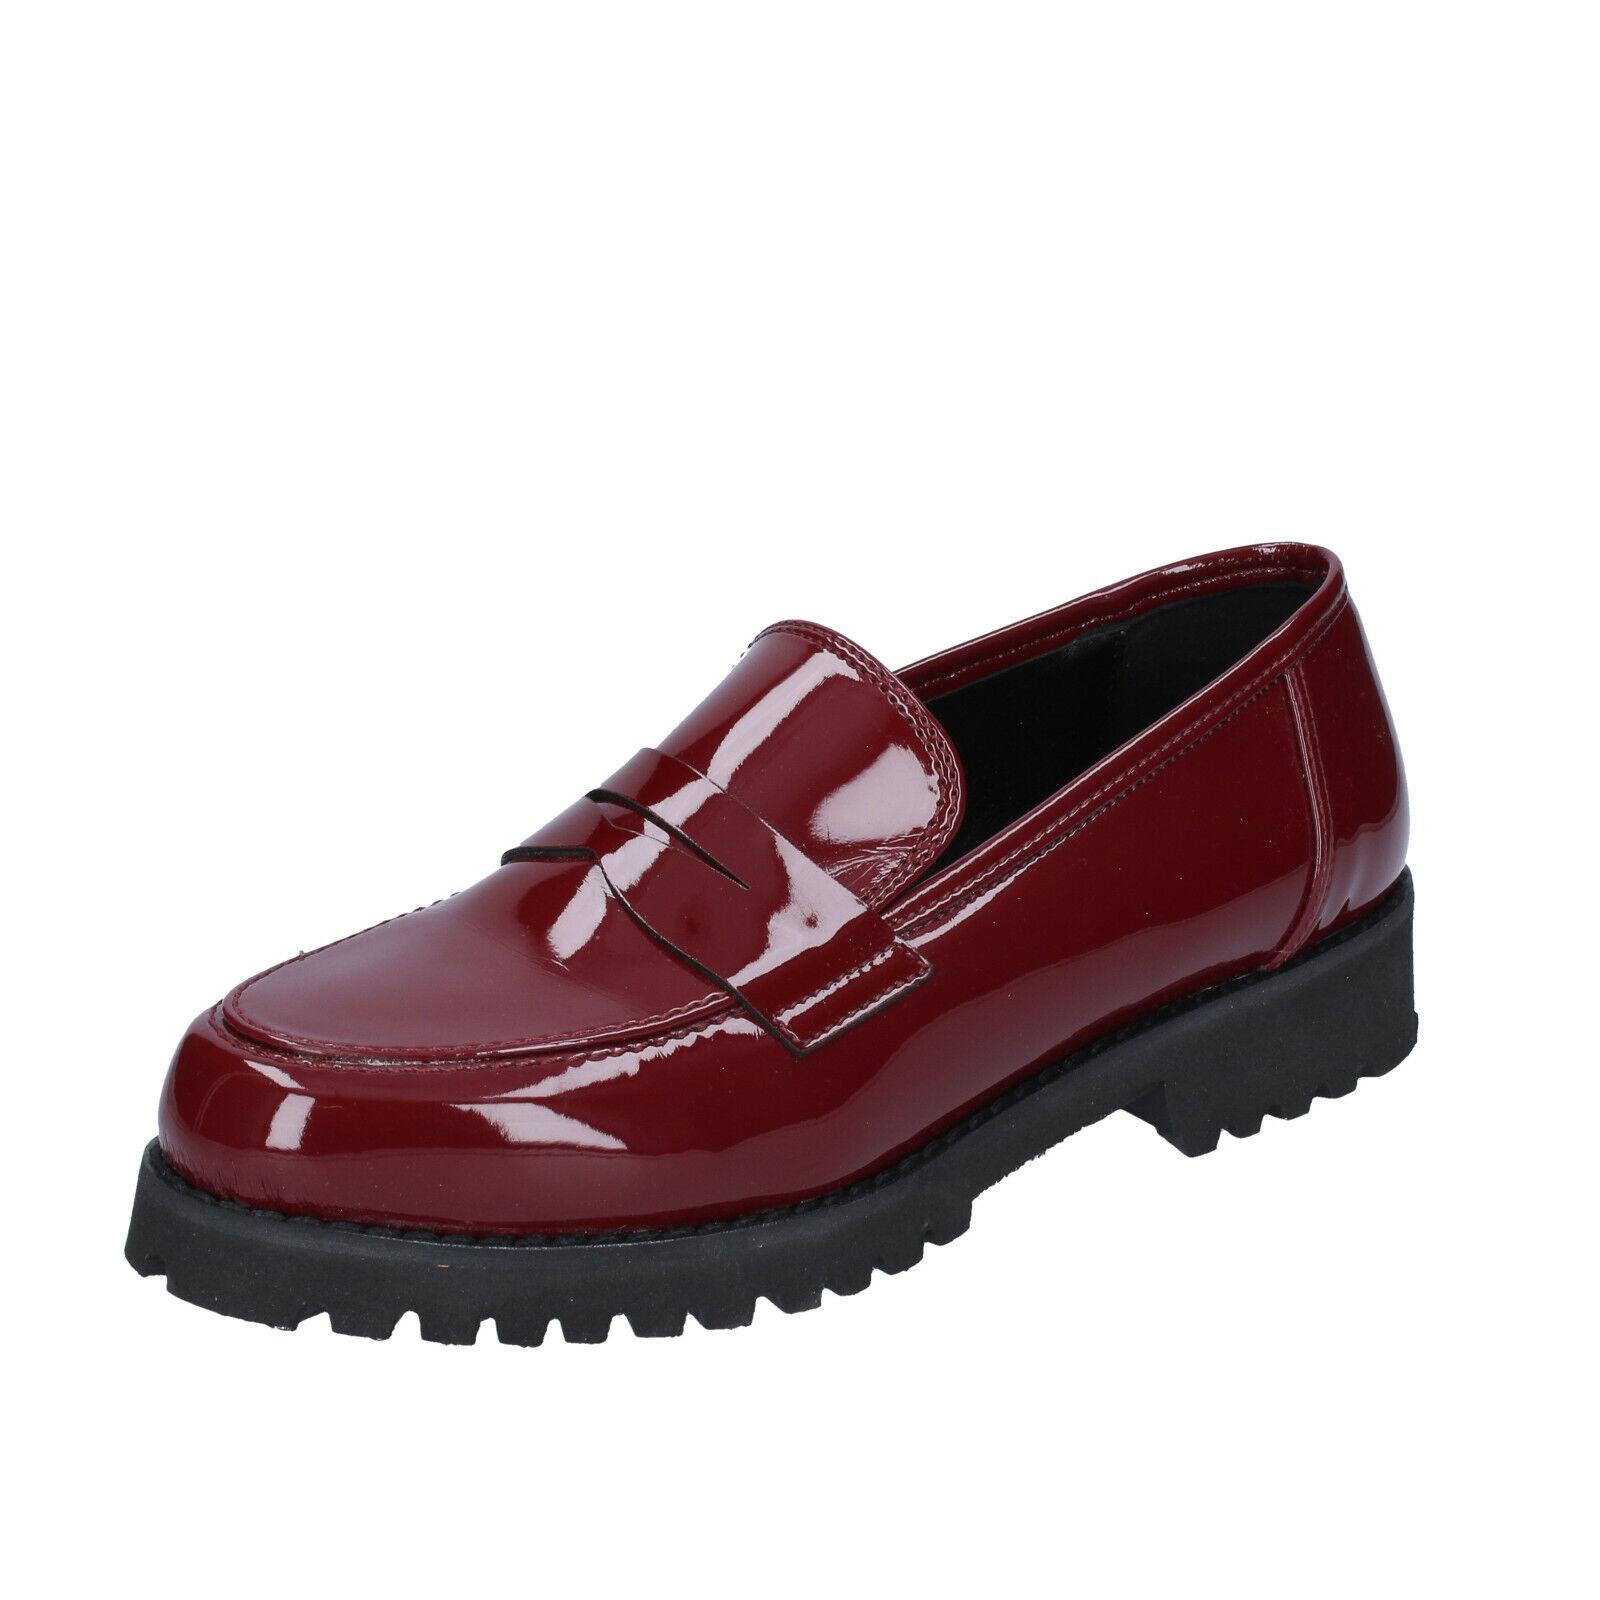 Wouomo sautope OLGA RUBINI 7 (EU 40) loafers burgundy patent leather BS840-40